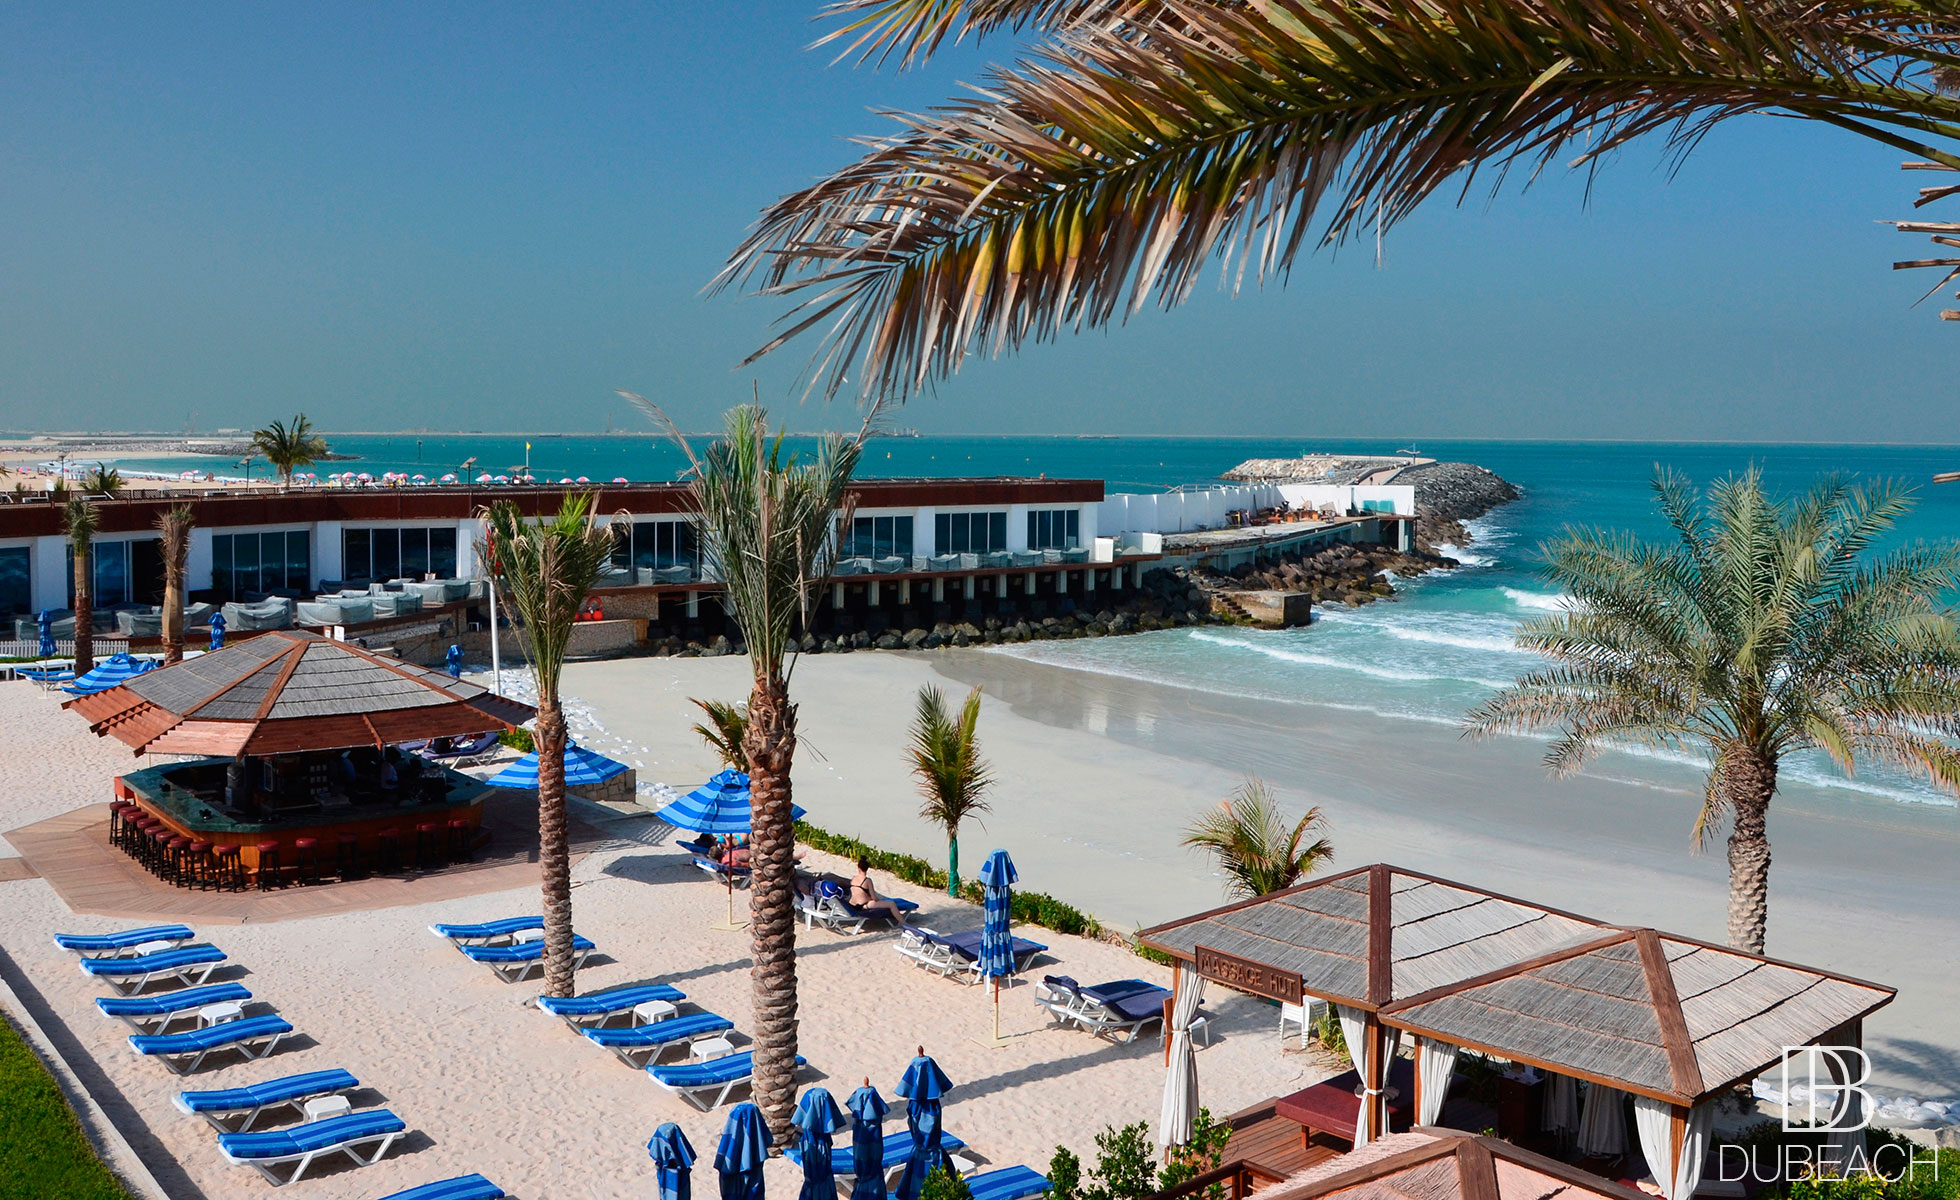 Ihram Kids For Sale Dubai: 10 Best Dubai Beach Resorts For Your 2019 Beach Vacation